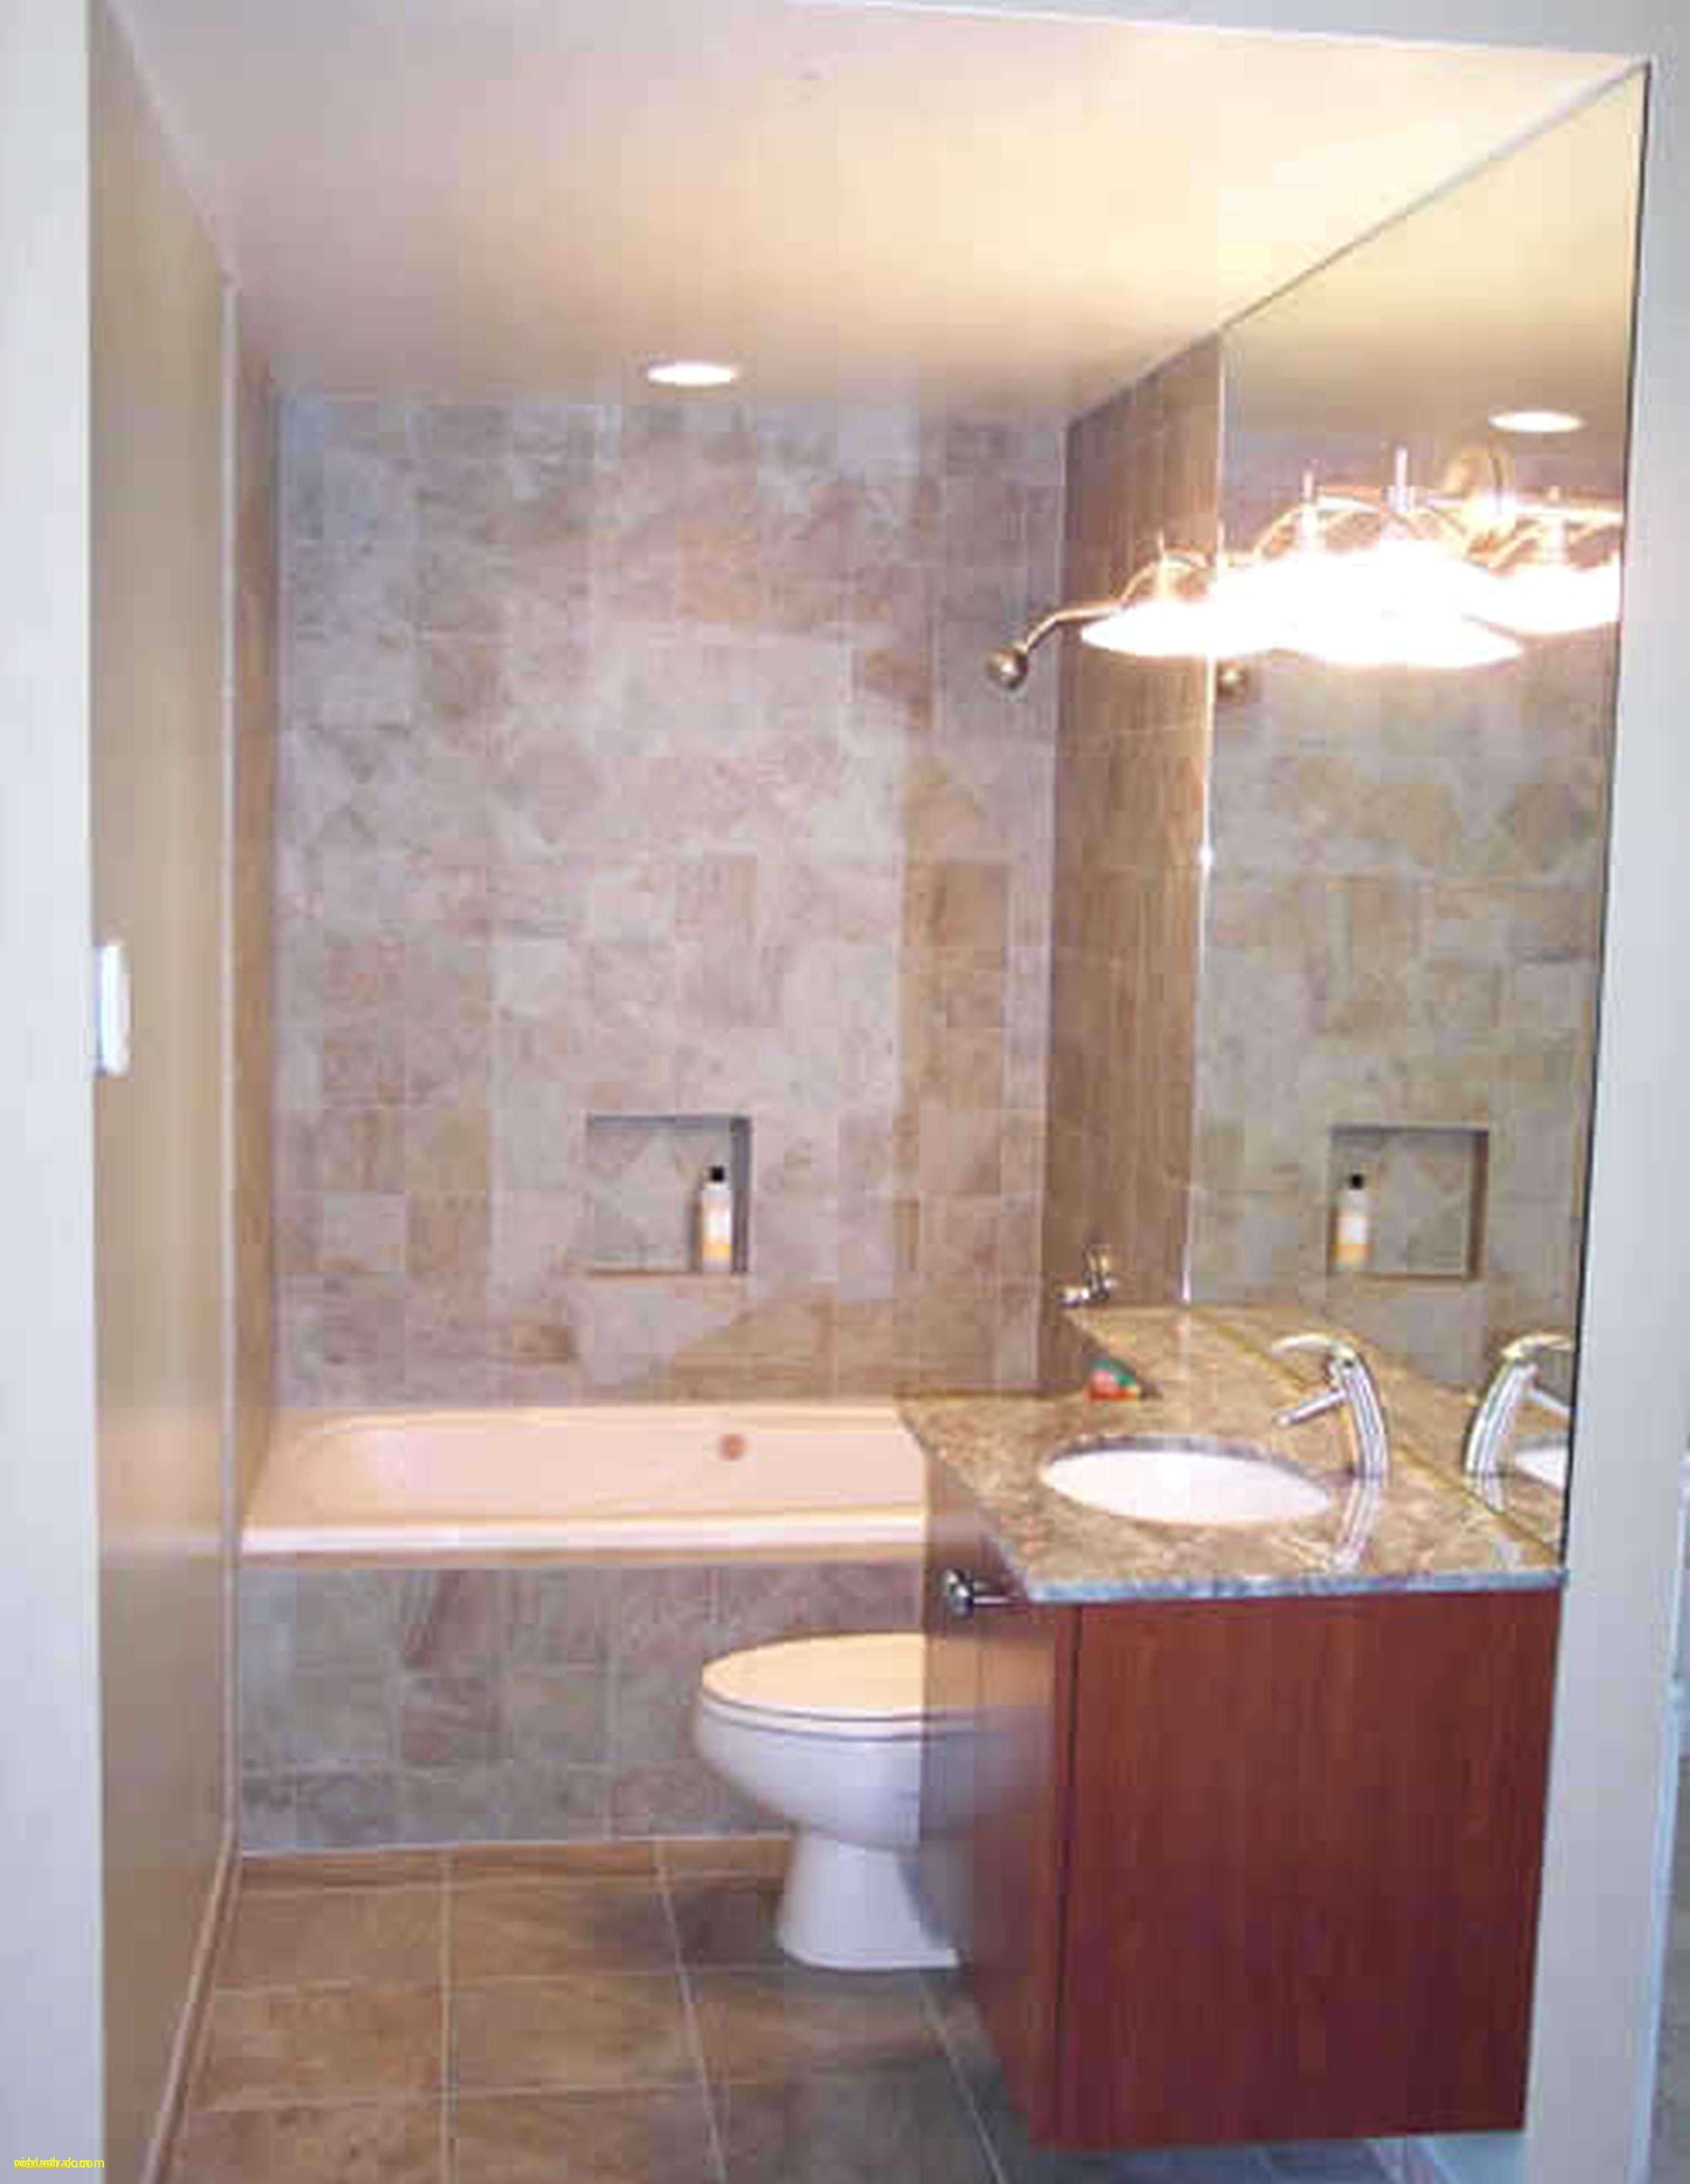 Awesome Bathroom Design 5 X 12 Awesome Bathroom Design 5 X 12 Delightful To Our Blog In This Parti Bathroom Interior Bathroom Layout Small Bathroom Decor